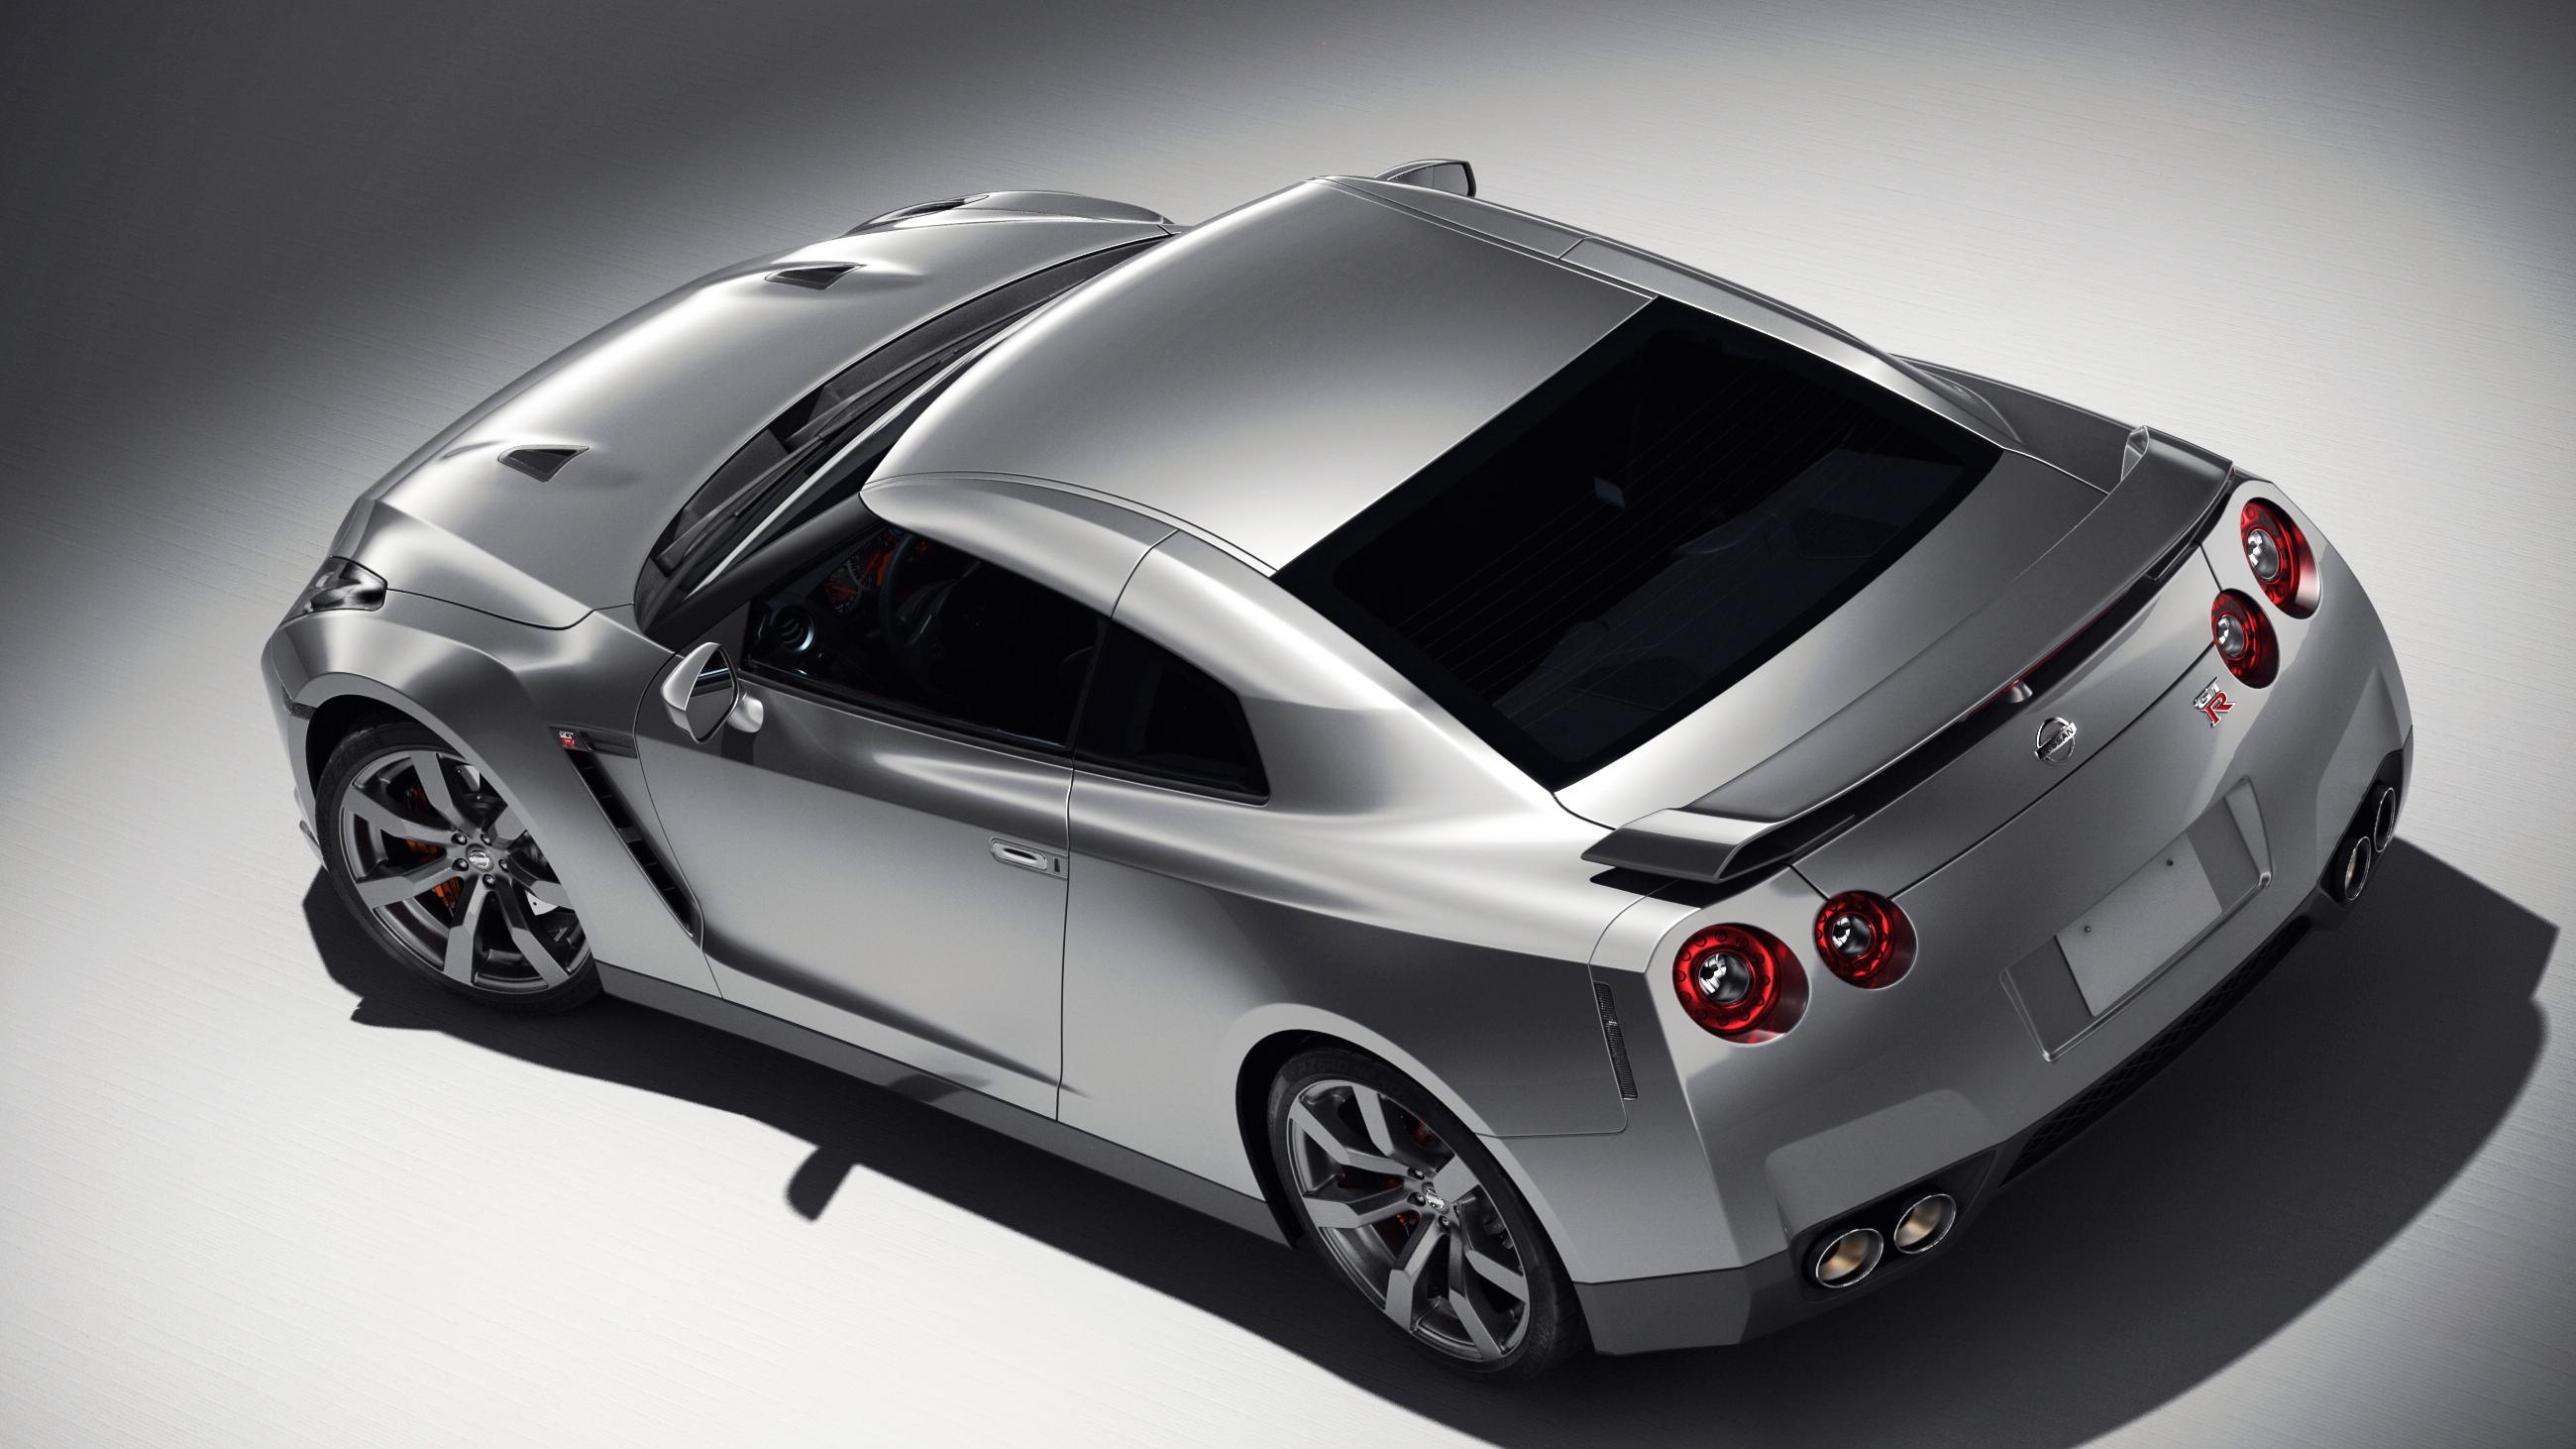 Silver Nissan GT-R by Laffonte